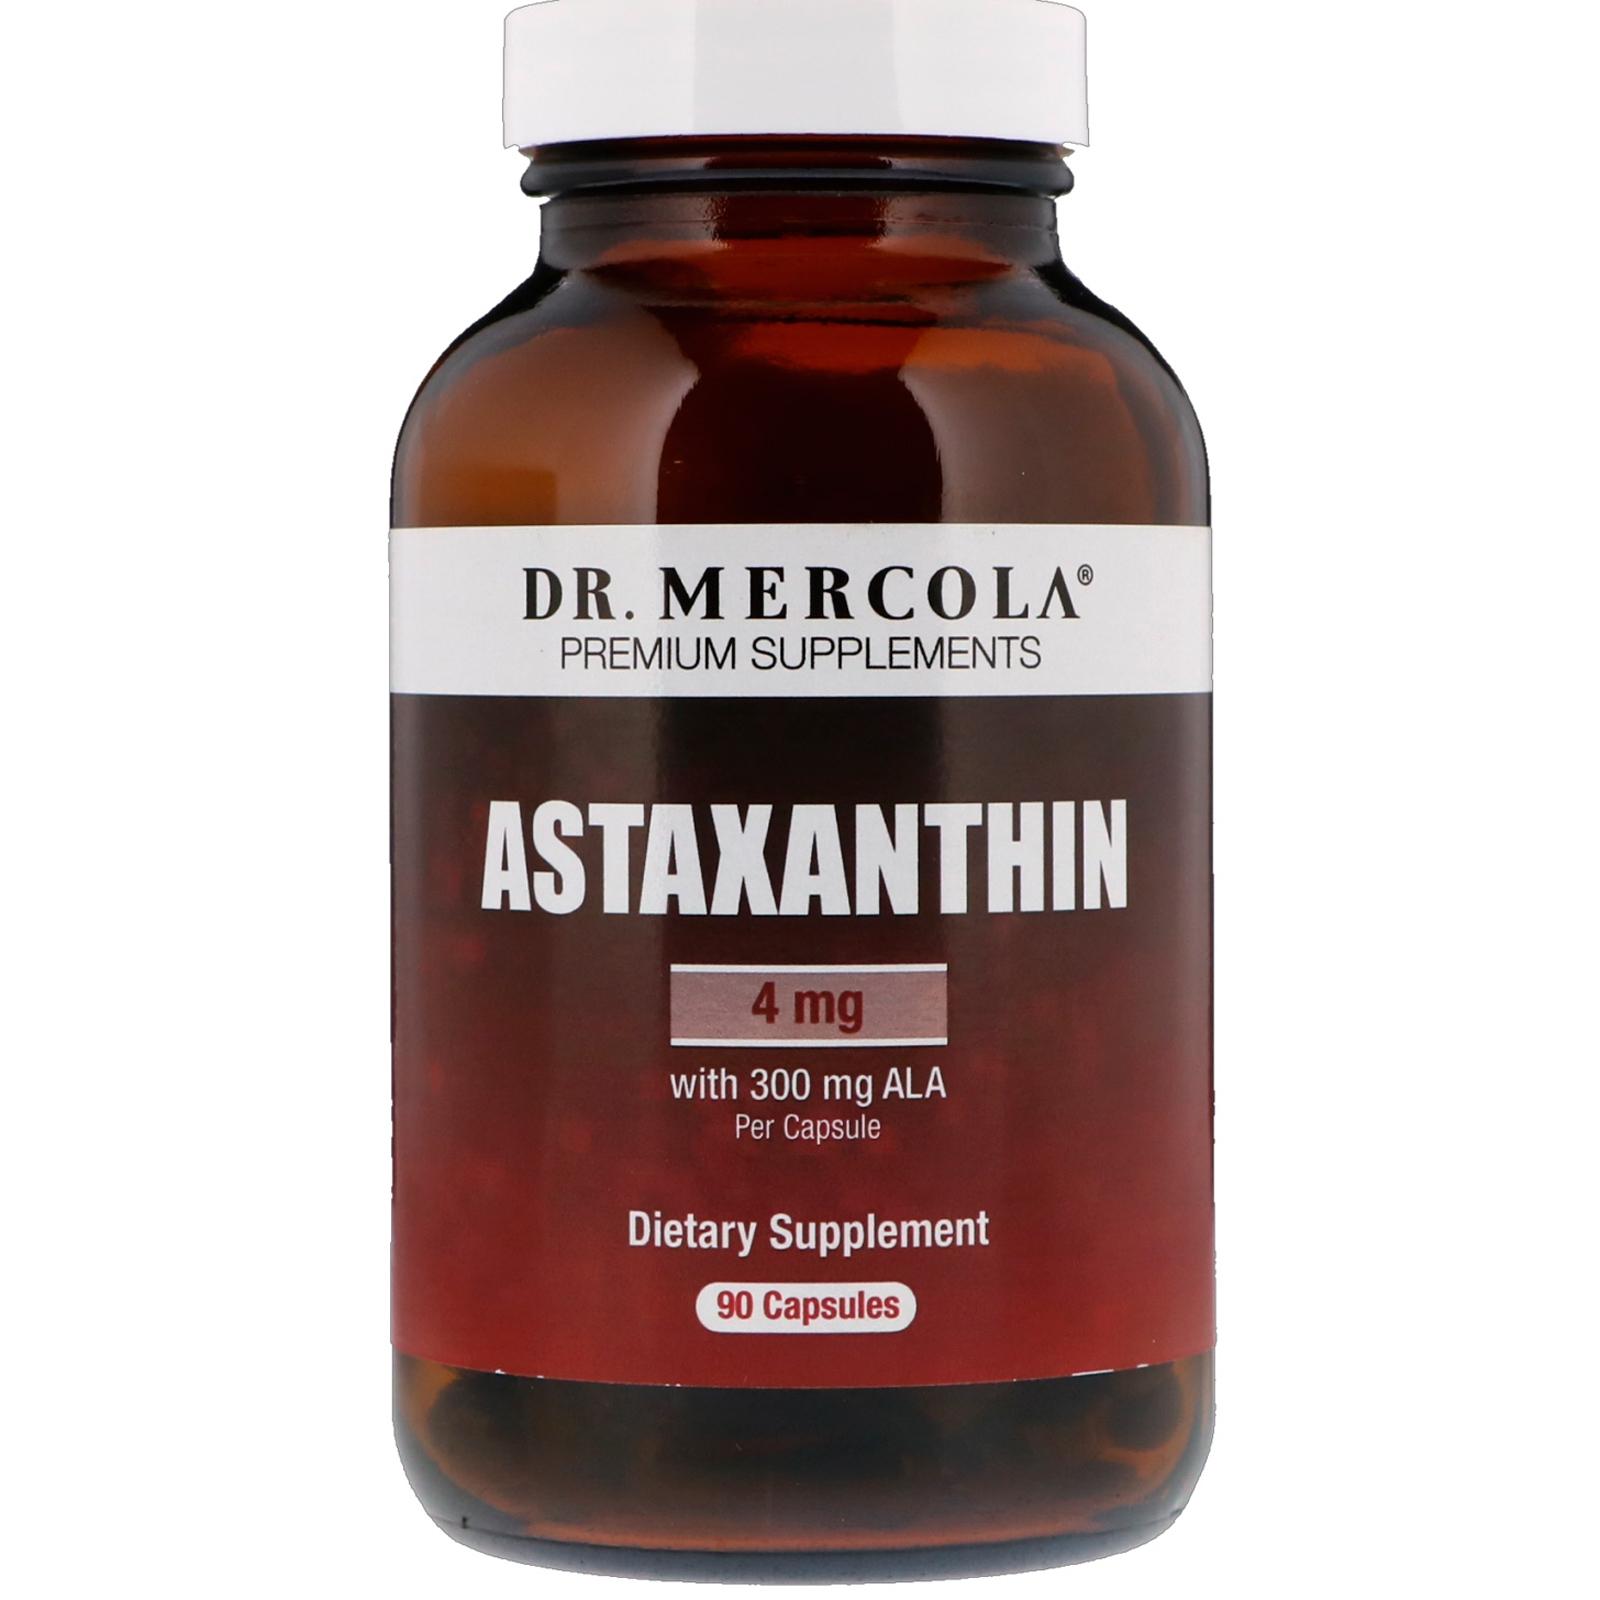 Image of Astaxantina (90 Licaps capsule) - Dr. Mercola 0810487036245